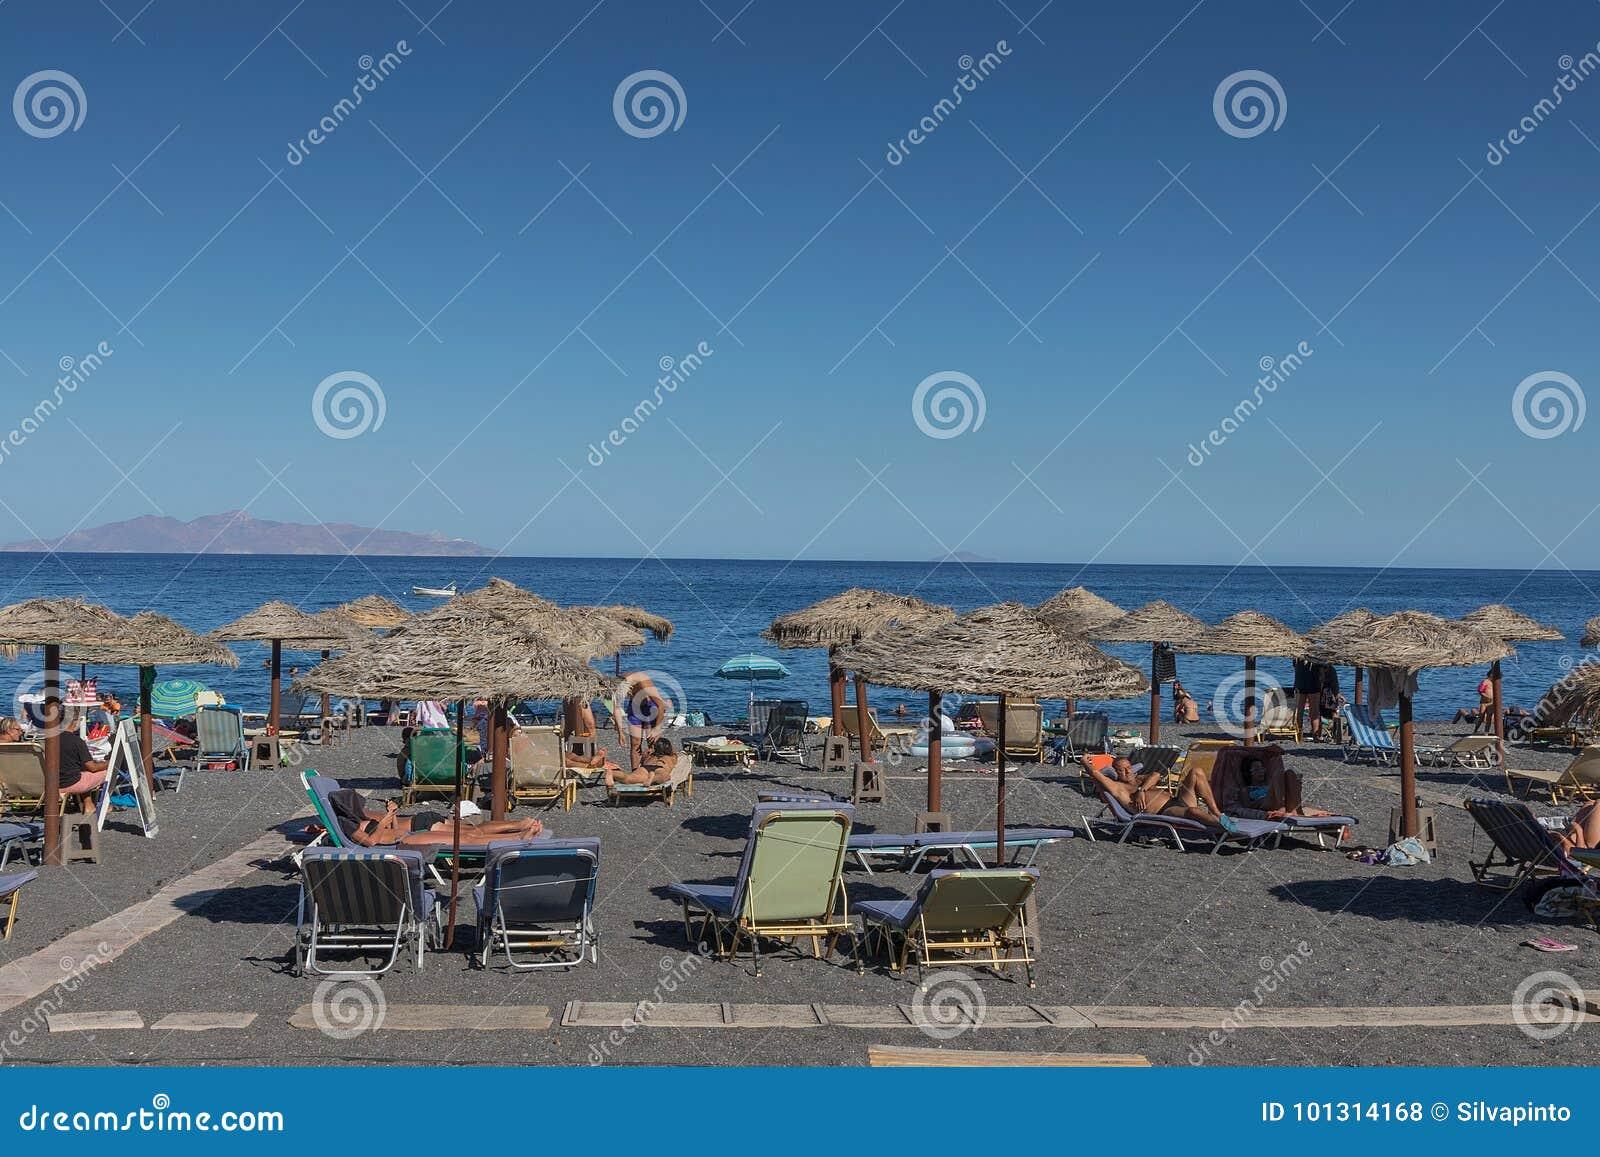 SANTORINI/GREECE 05 SEP, Kamari plaża w Santorini -, Grecja